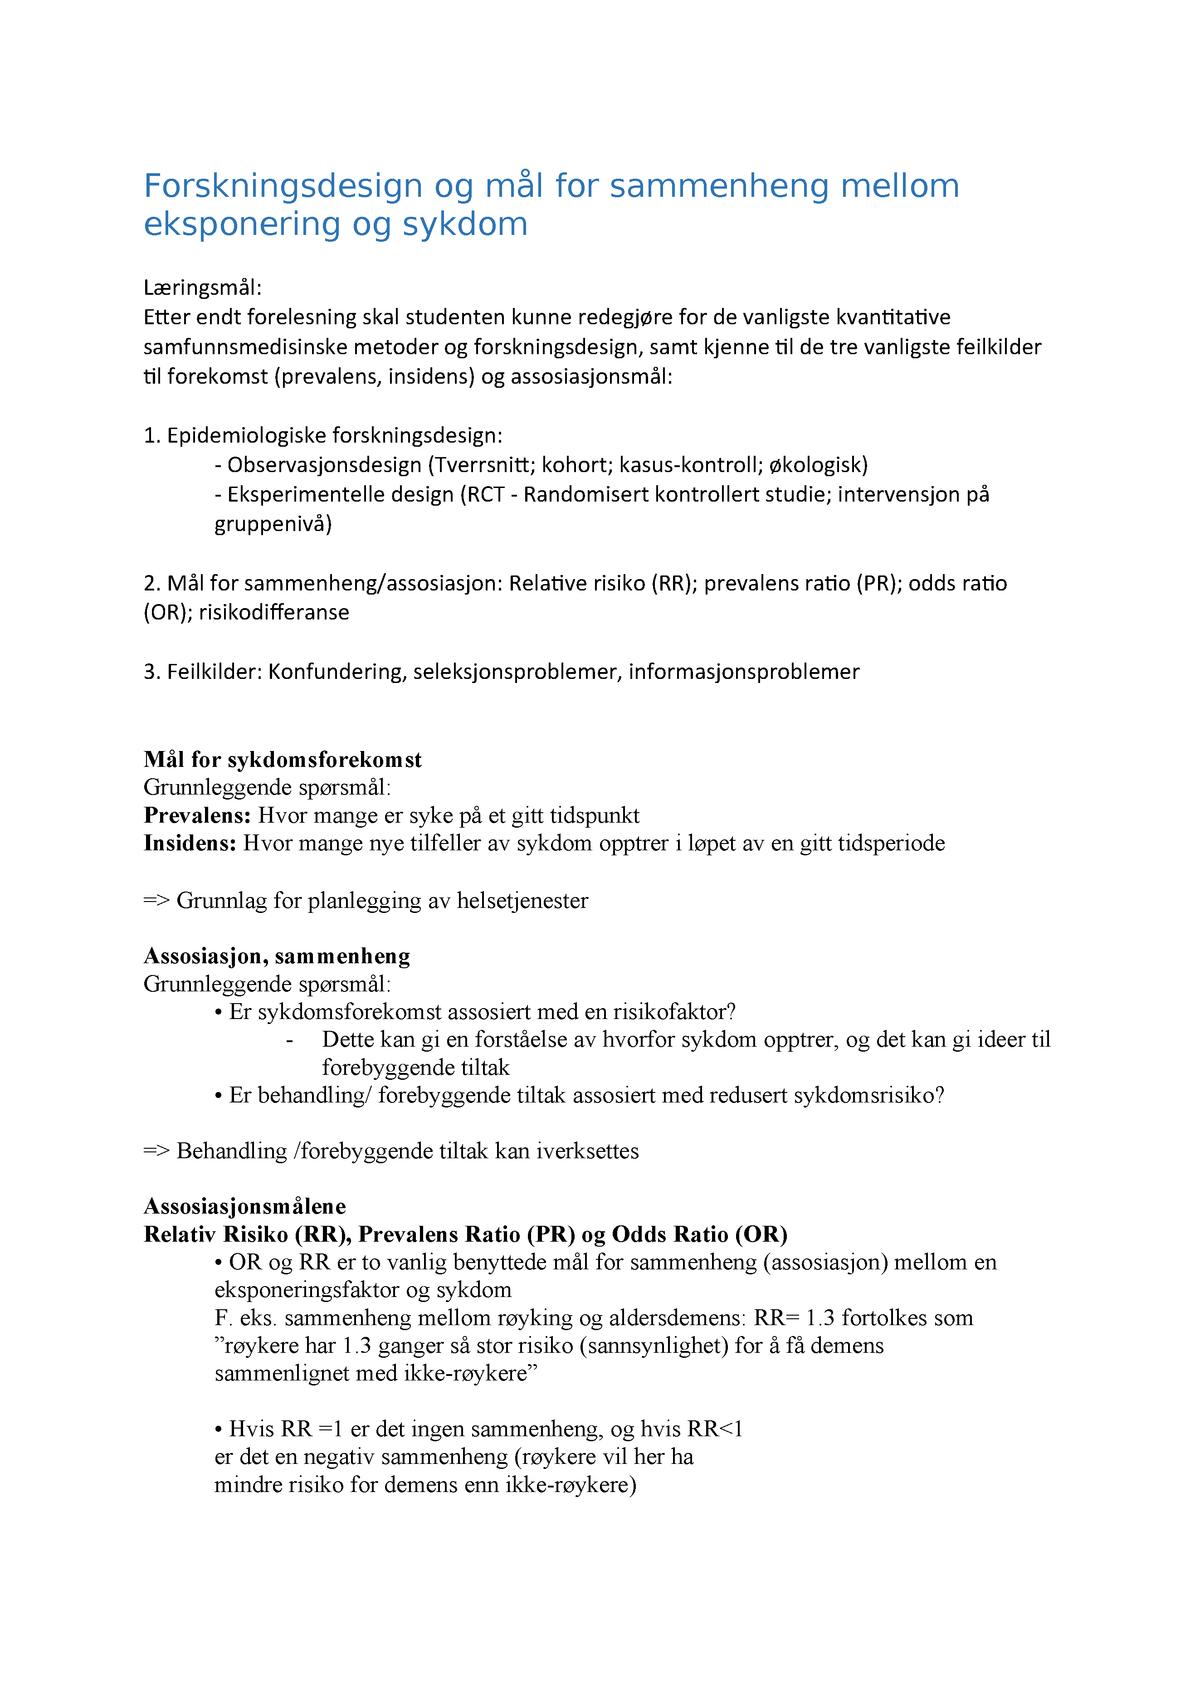 a957df3b6 Forskningsdesign og mål for sammenheng mellom eksponering - StuDocu